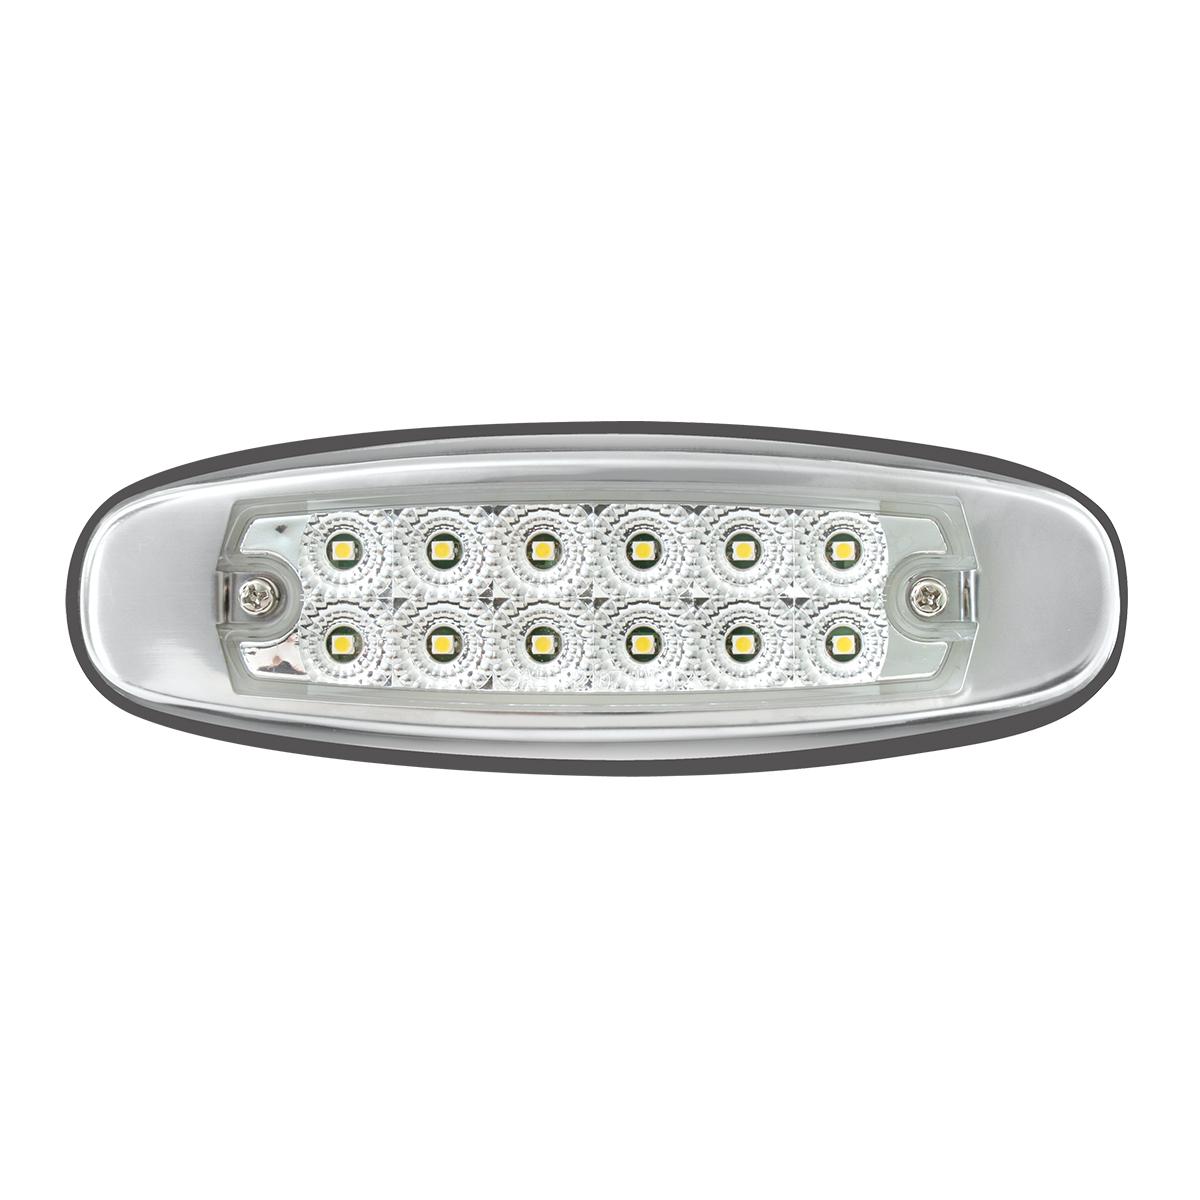 78569 Ultra Thin Spyder LED Marker Light w/ Stainless Steel Bezel In Clear Lens